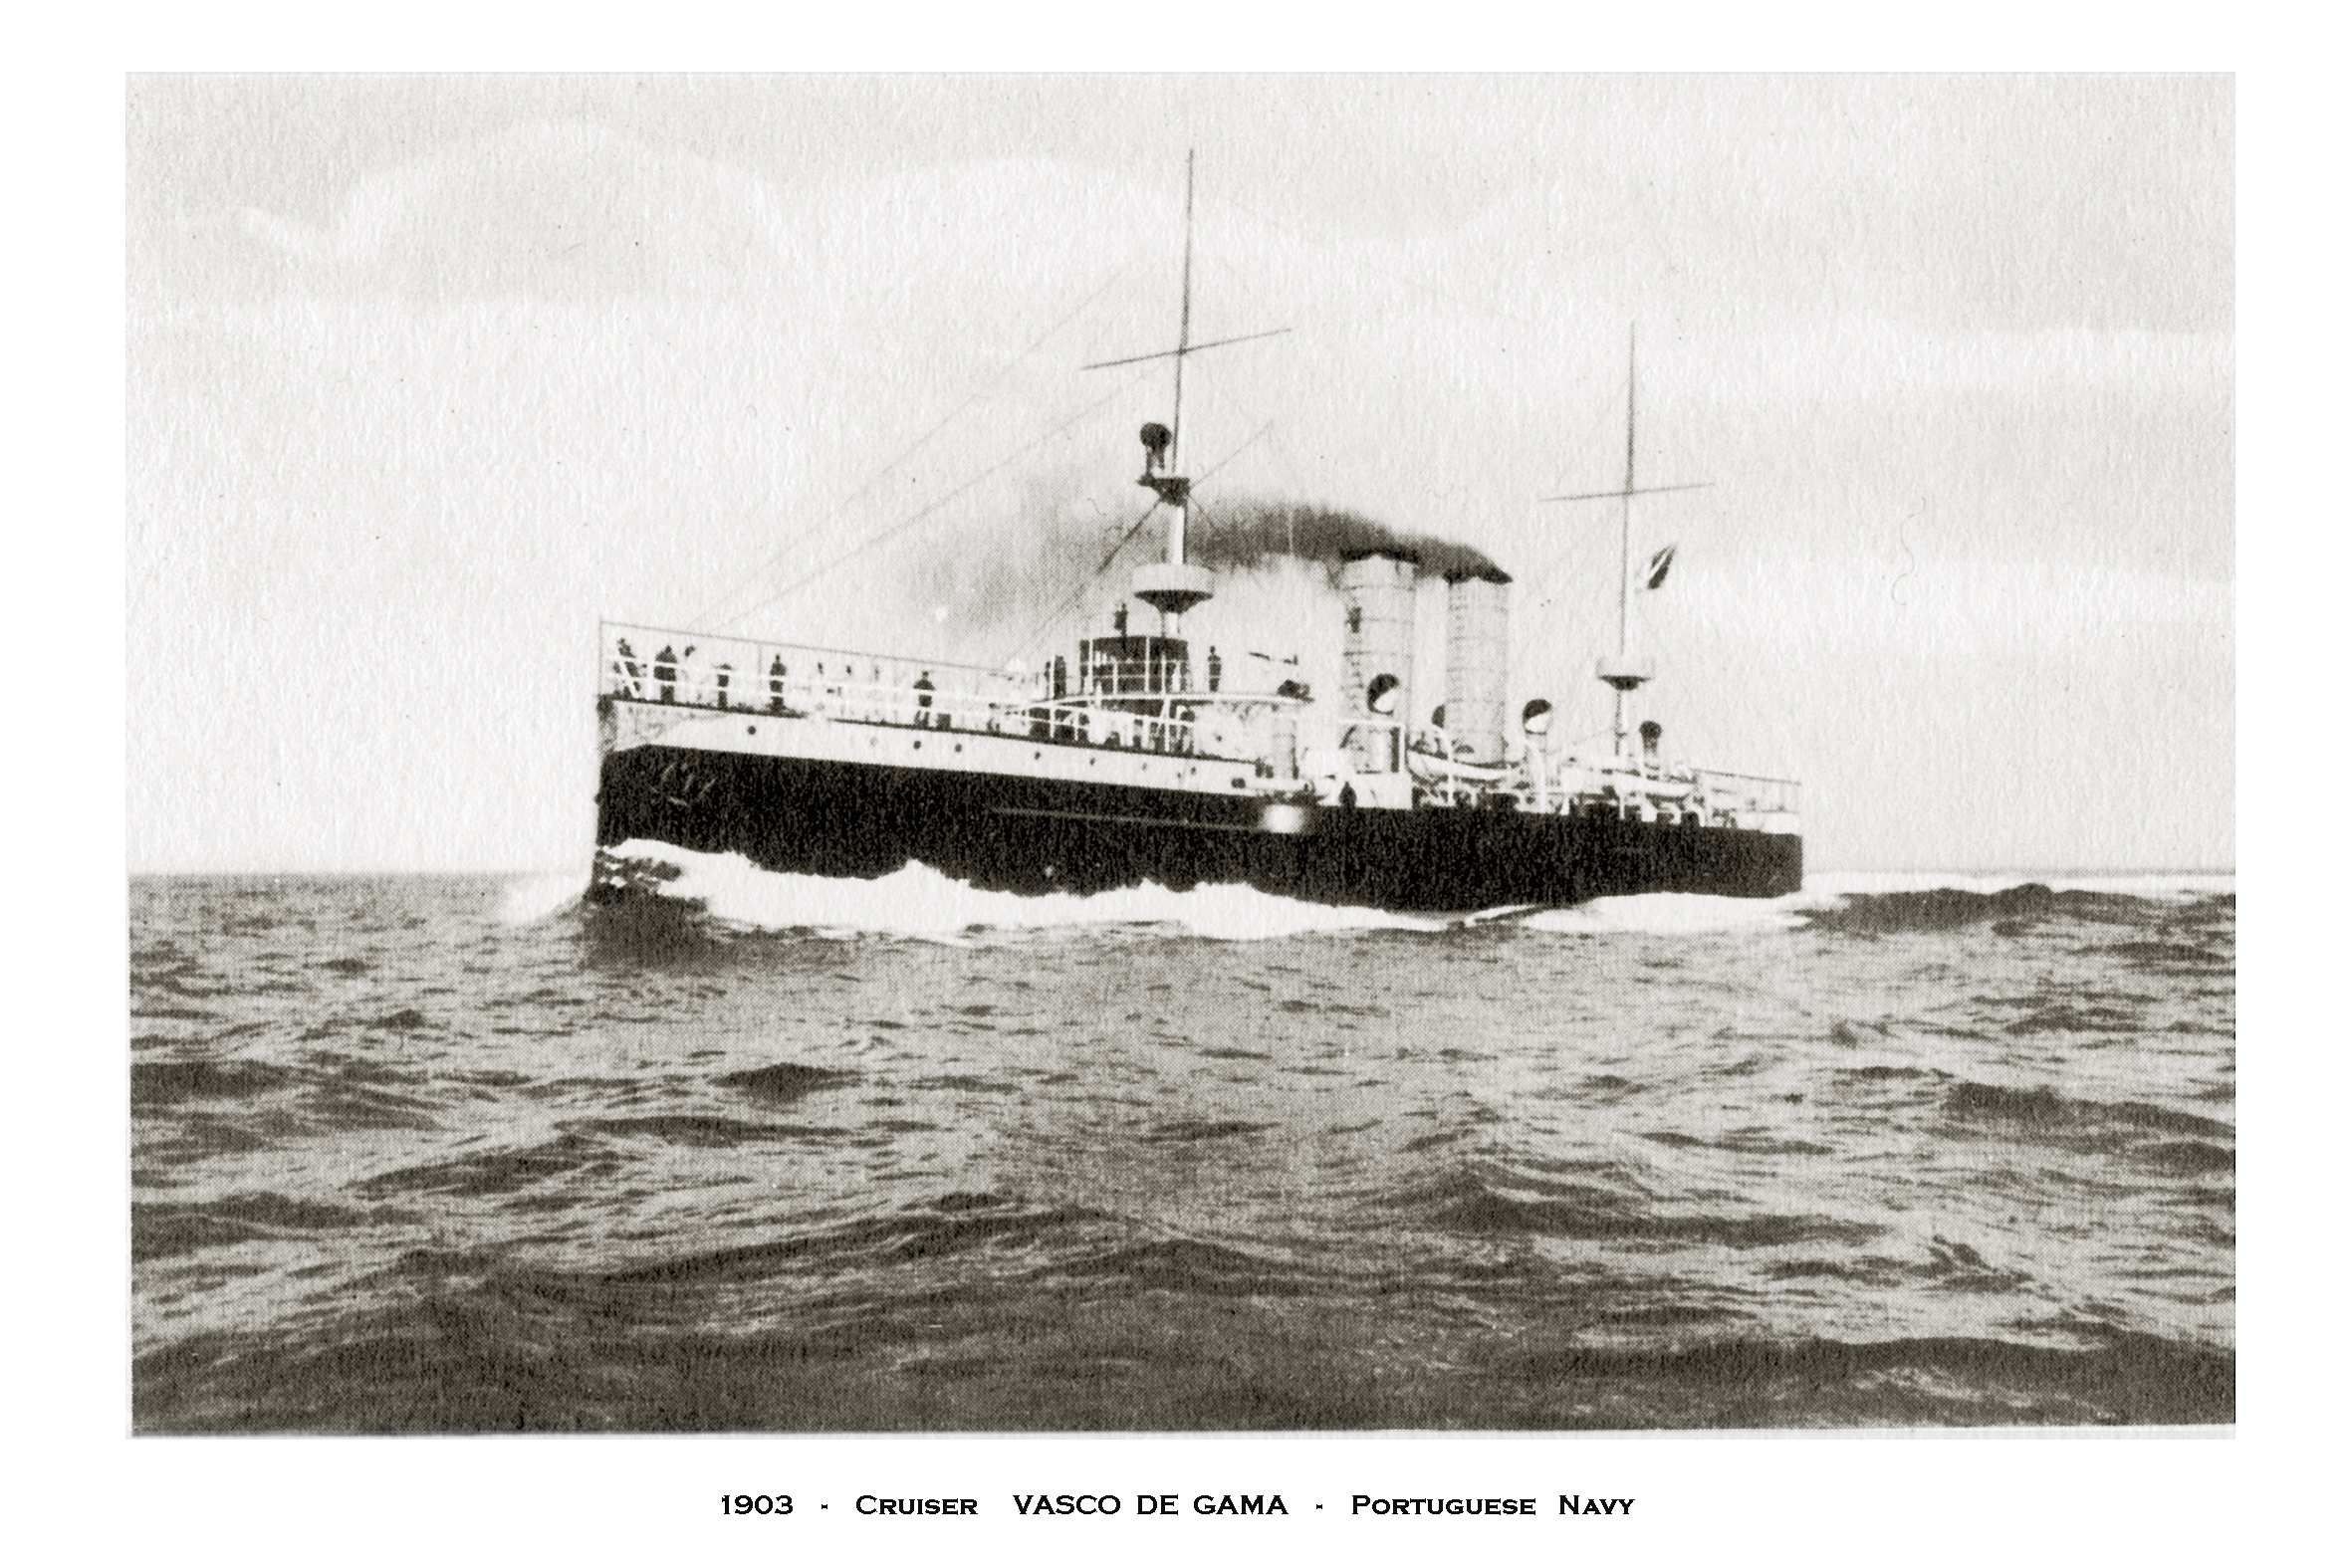 VASCO DA GAMA 1903_thumb.jpg